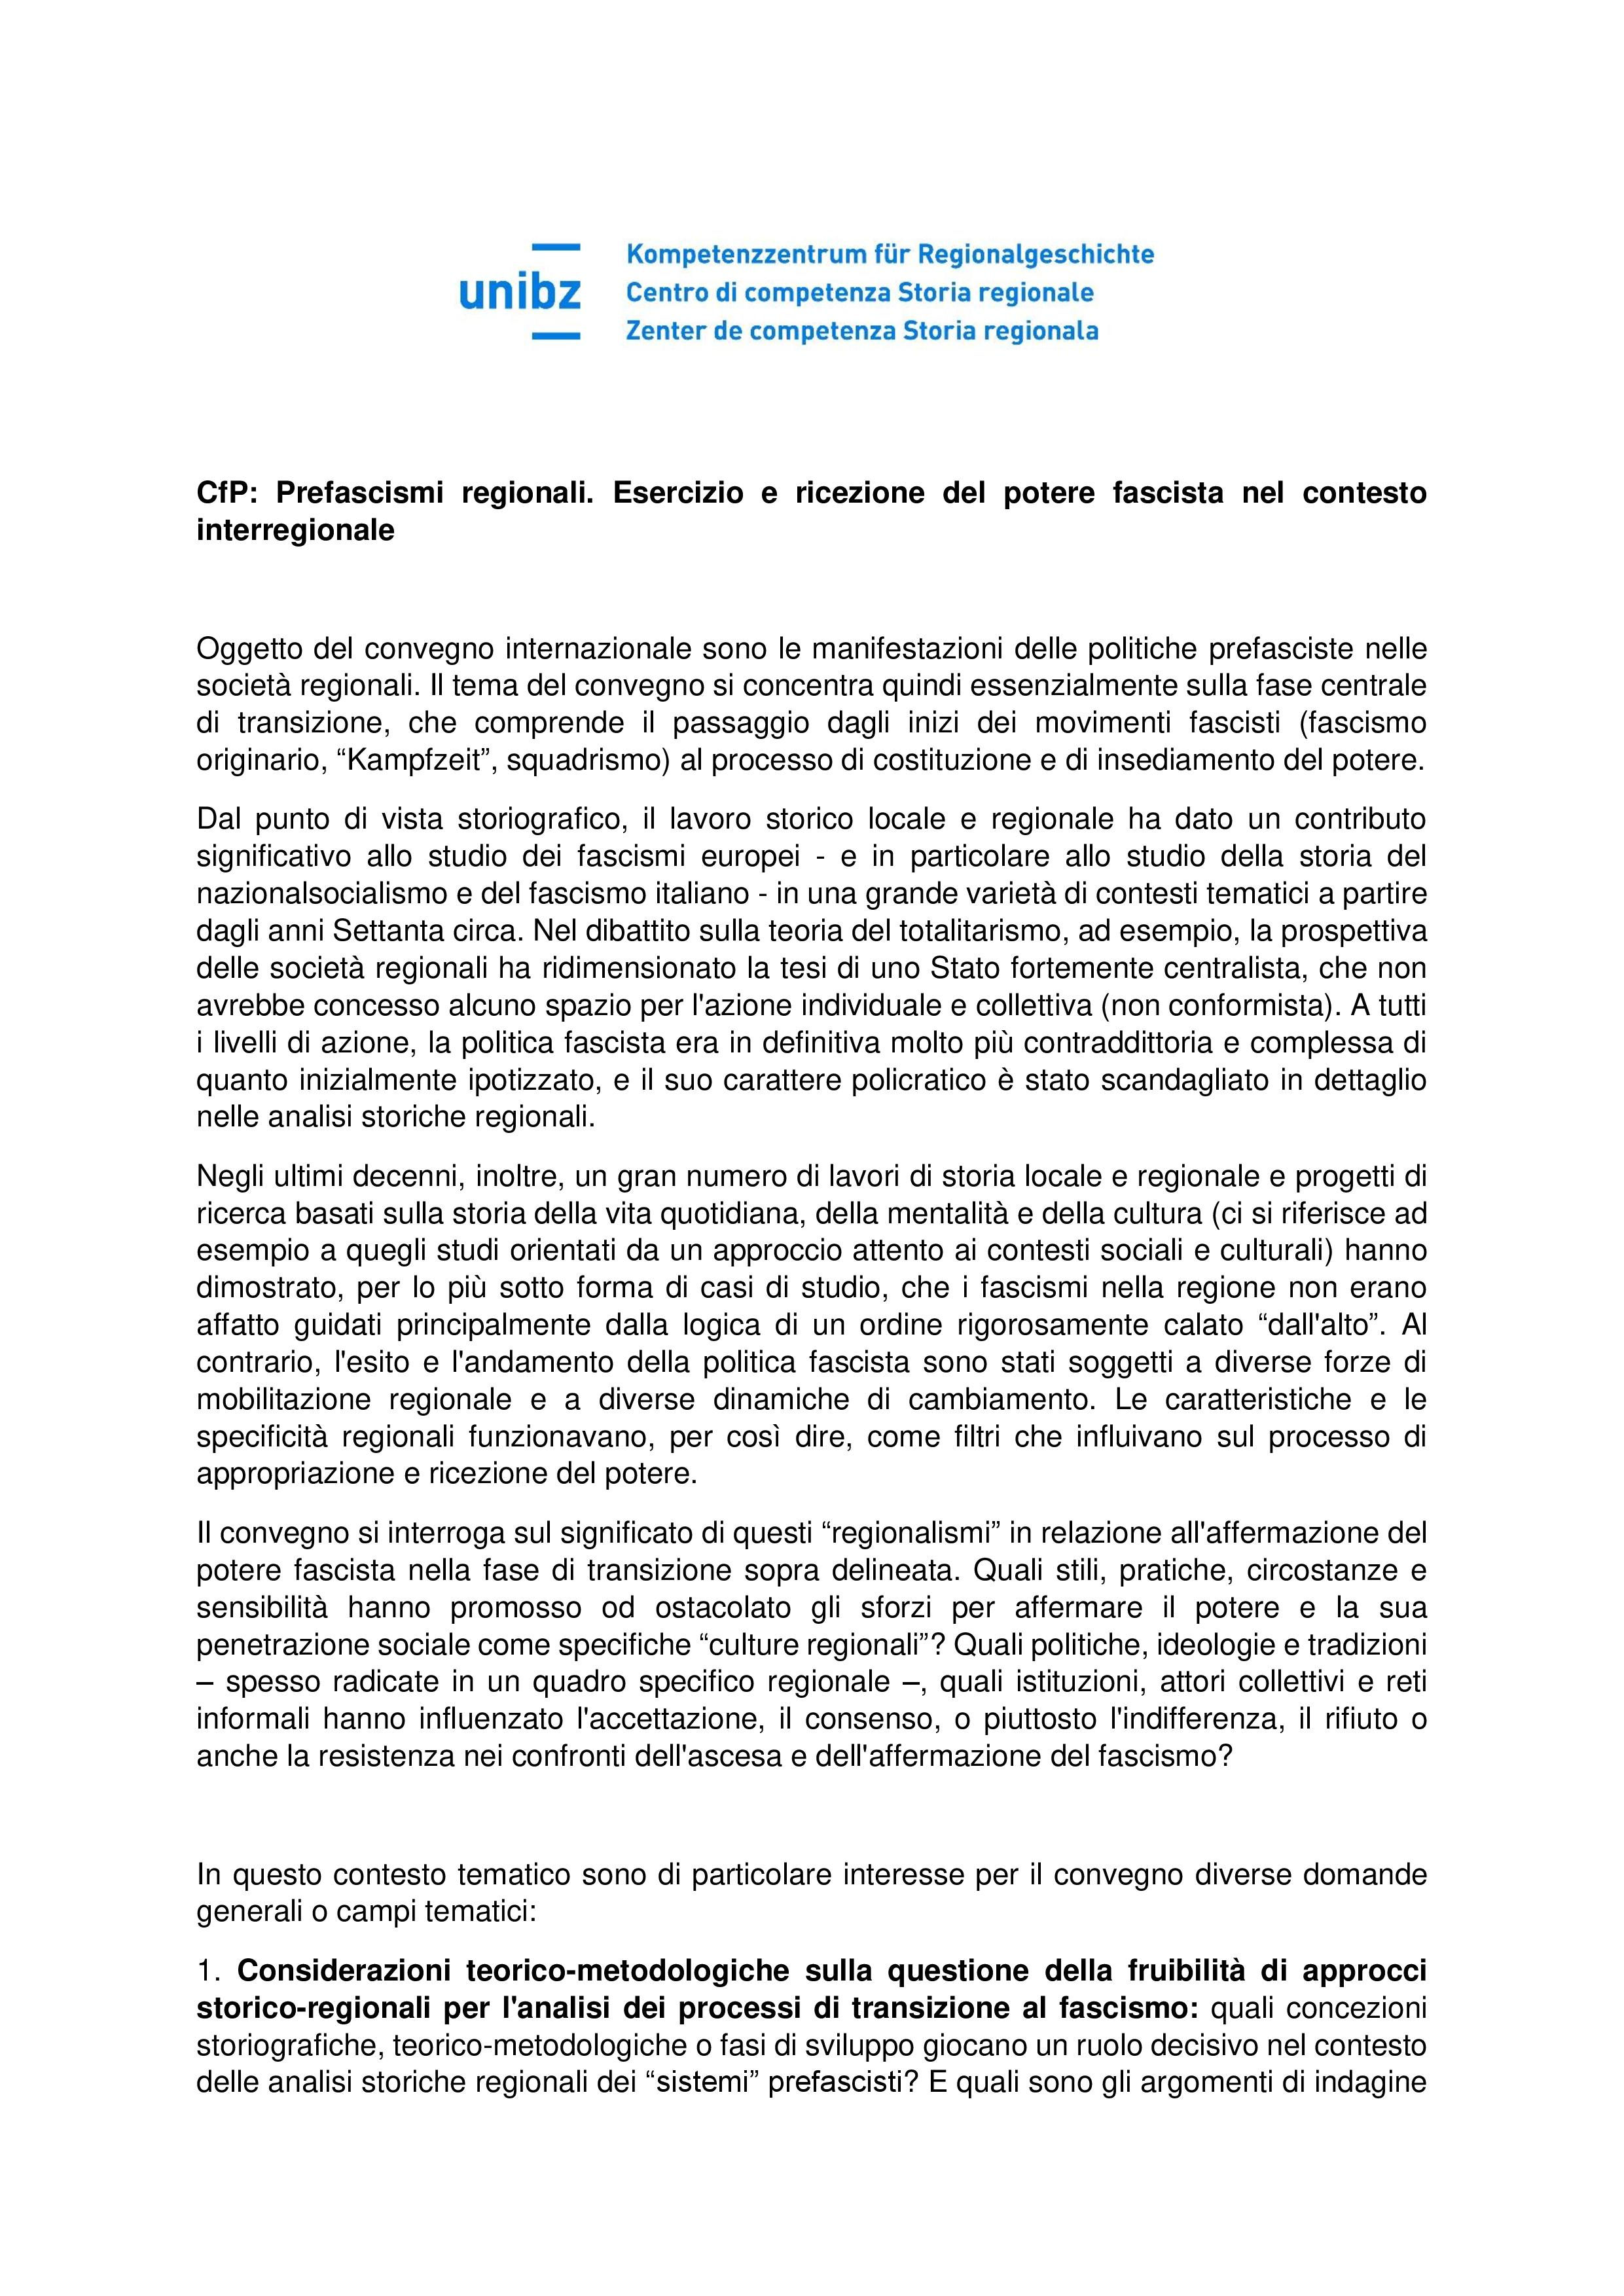 CfP_Prefascismi-page-001